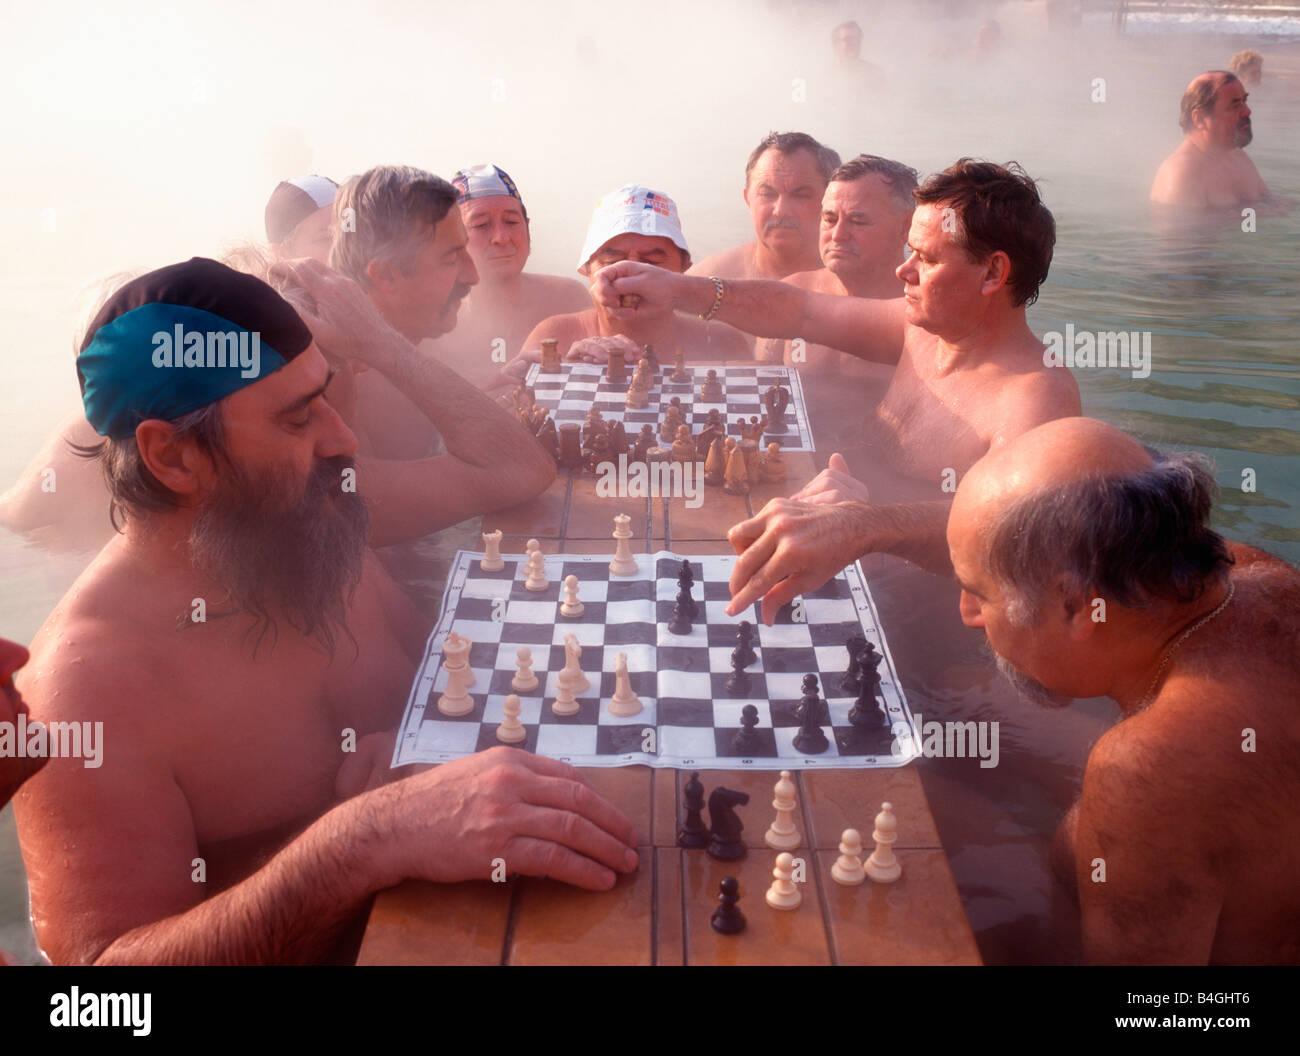 HUNGARY BUDAPEST SZECHENYI THERMAL BATH CHESS PLAYERS IN WATER - Stock Image